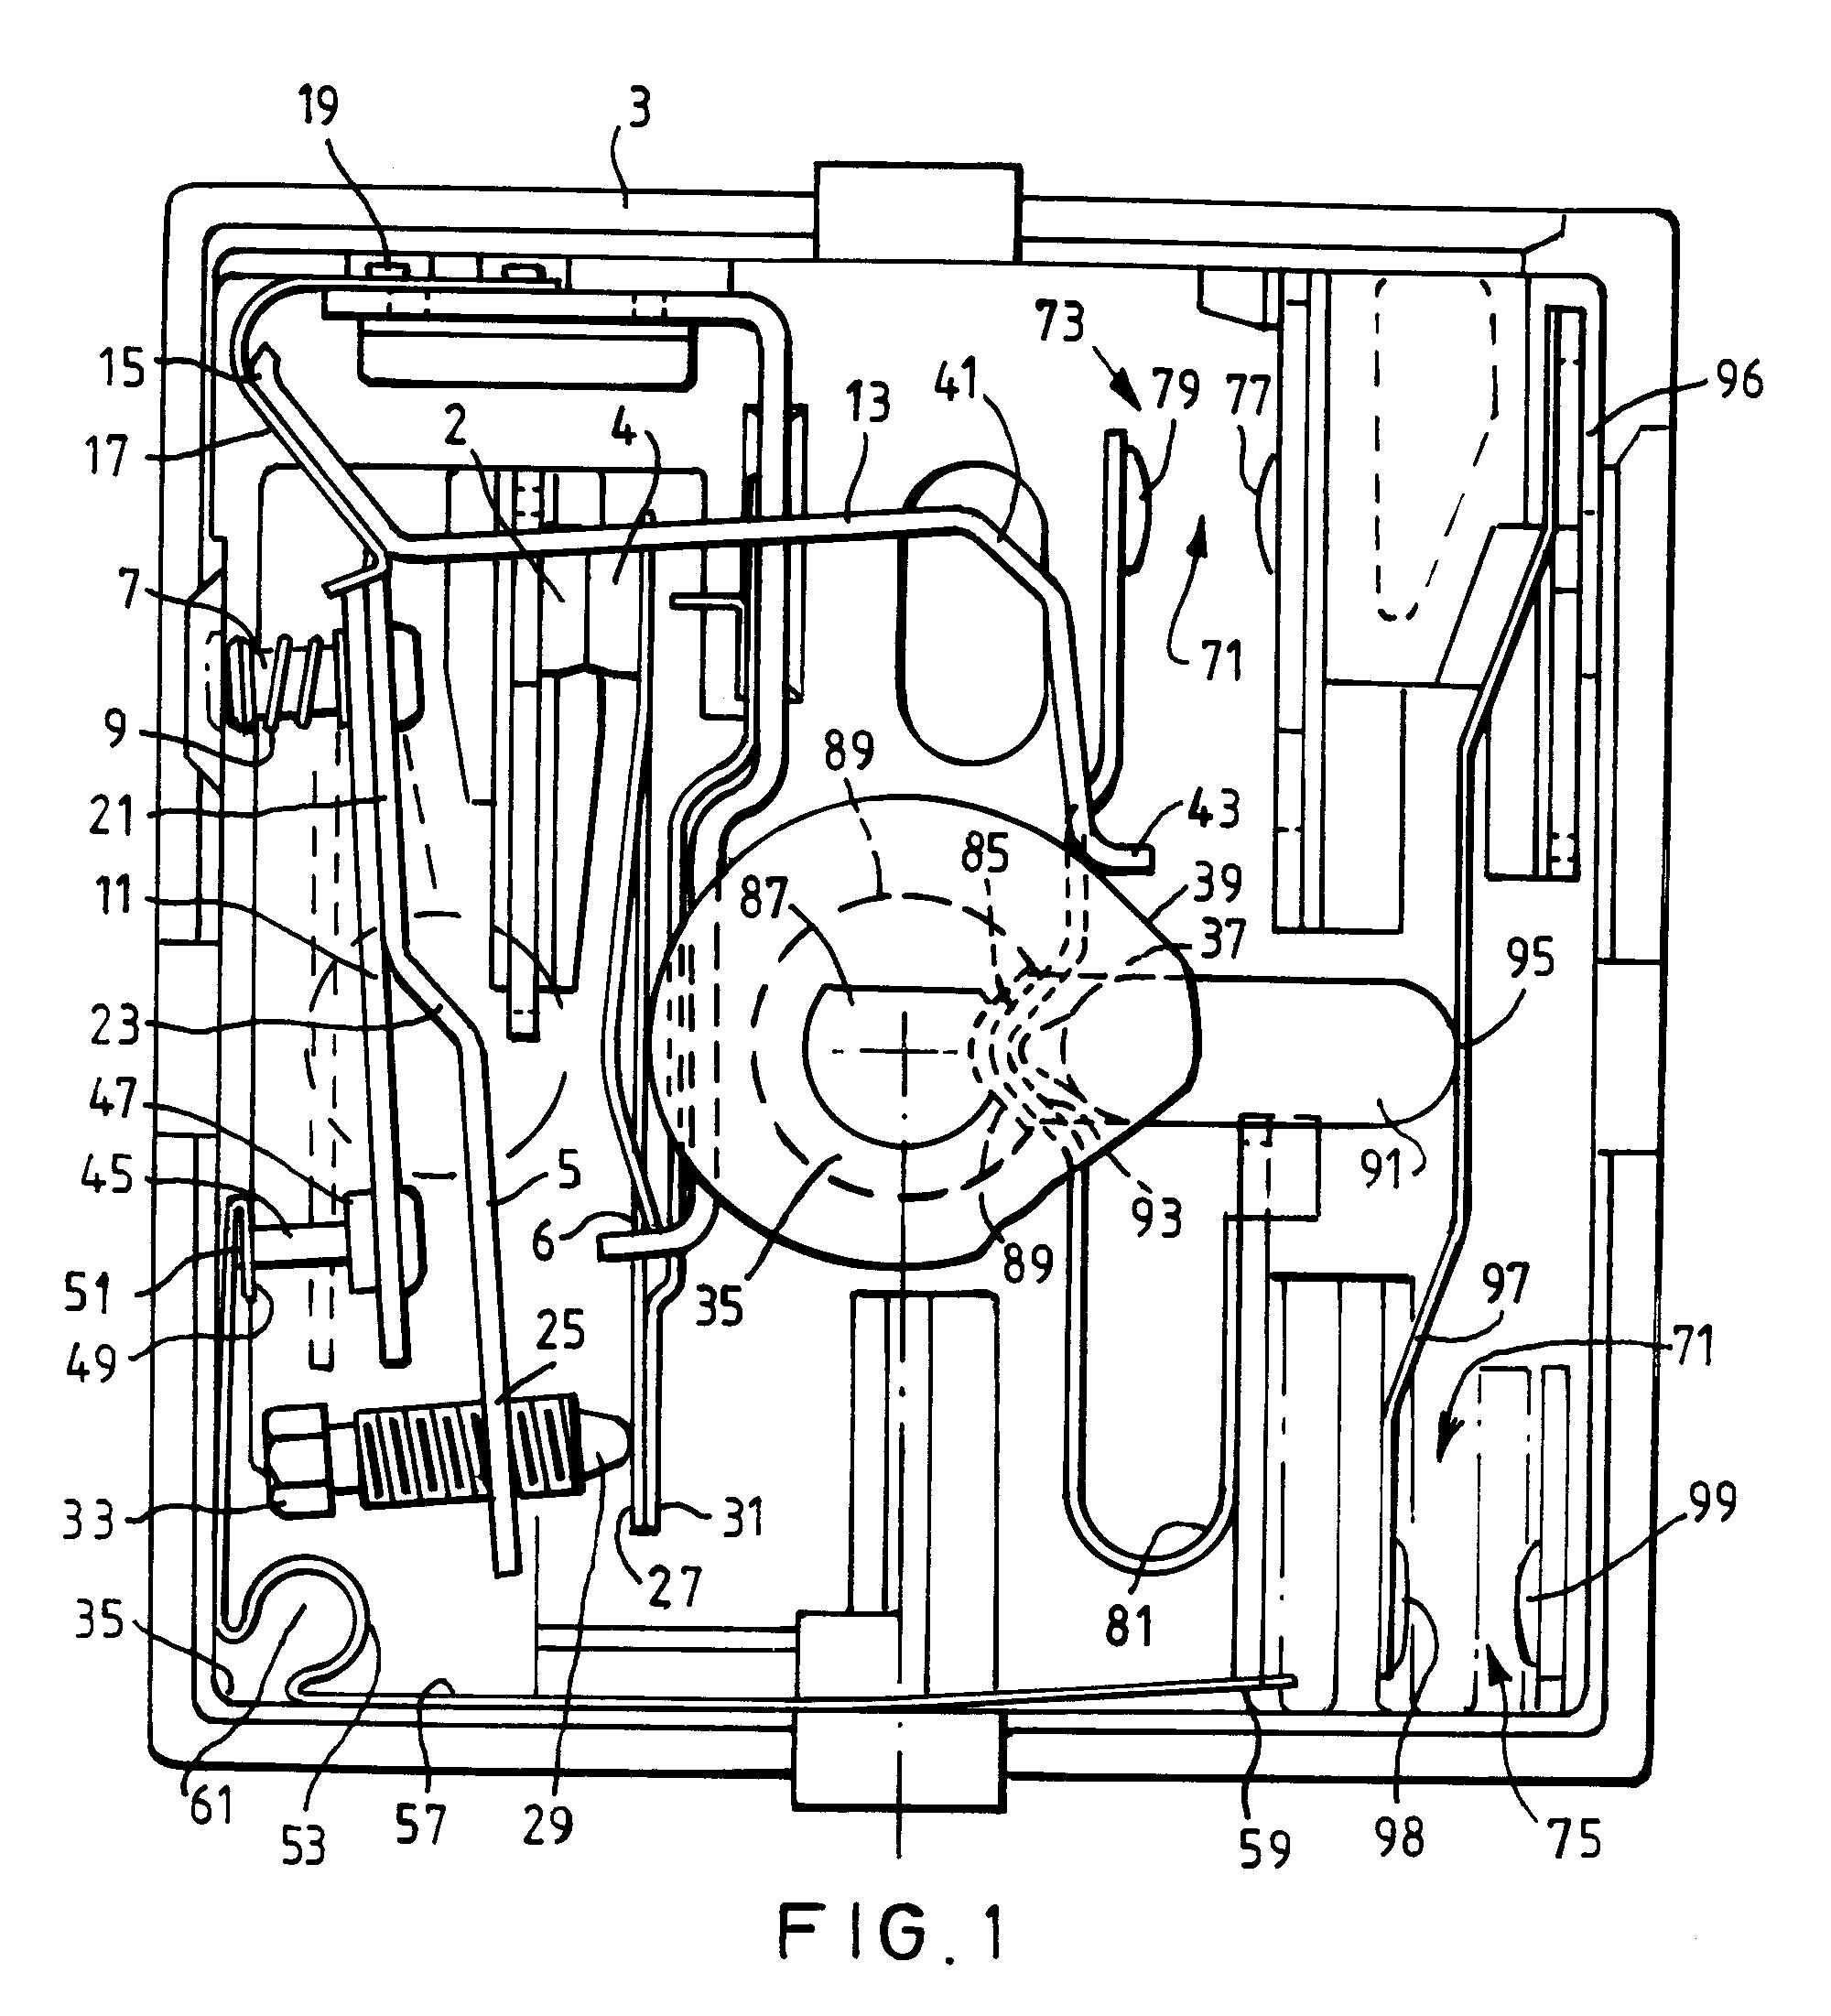 diamond h simmerstat wiring diagram   35 wiring diagram